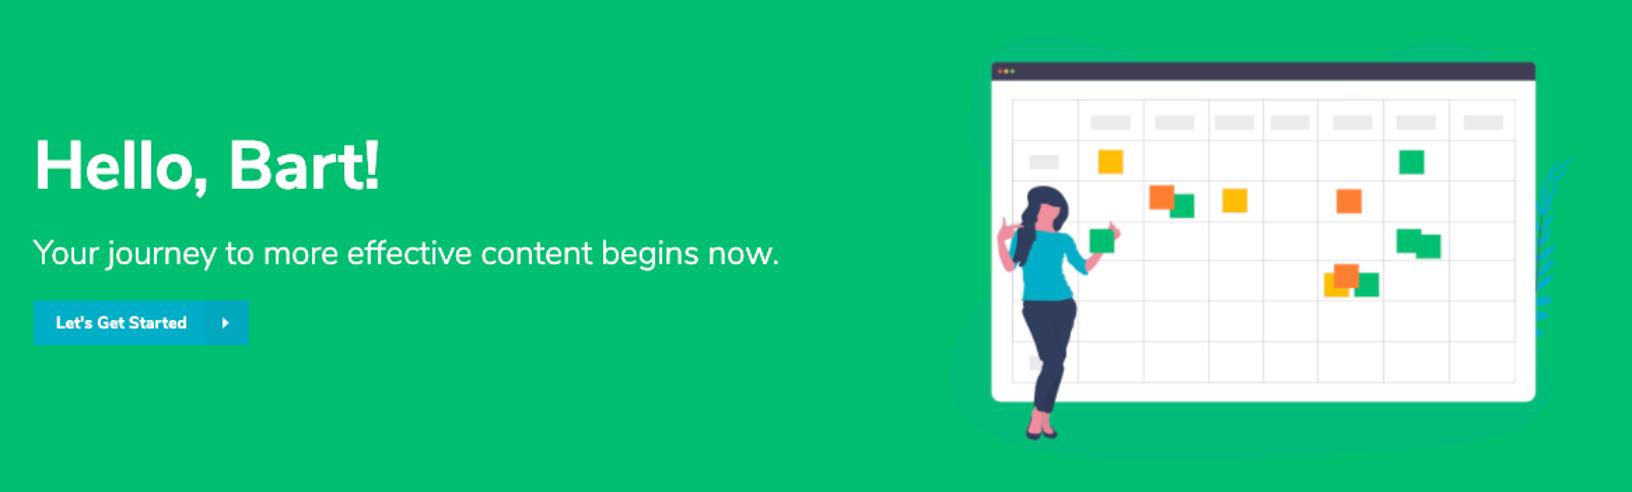 Cobomba Welcome Screen: Screen shot encouraging user to begin planning effective marketing content